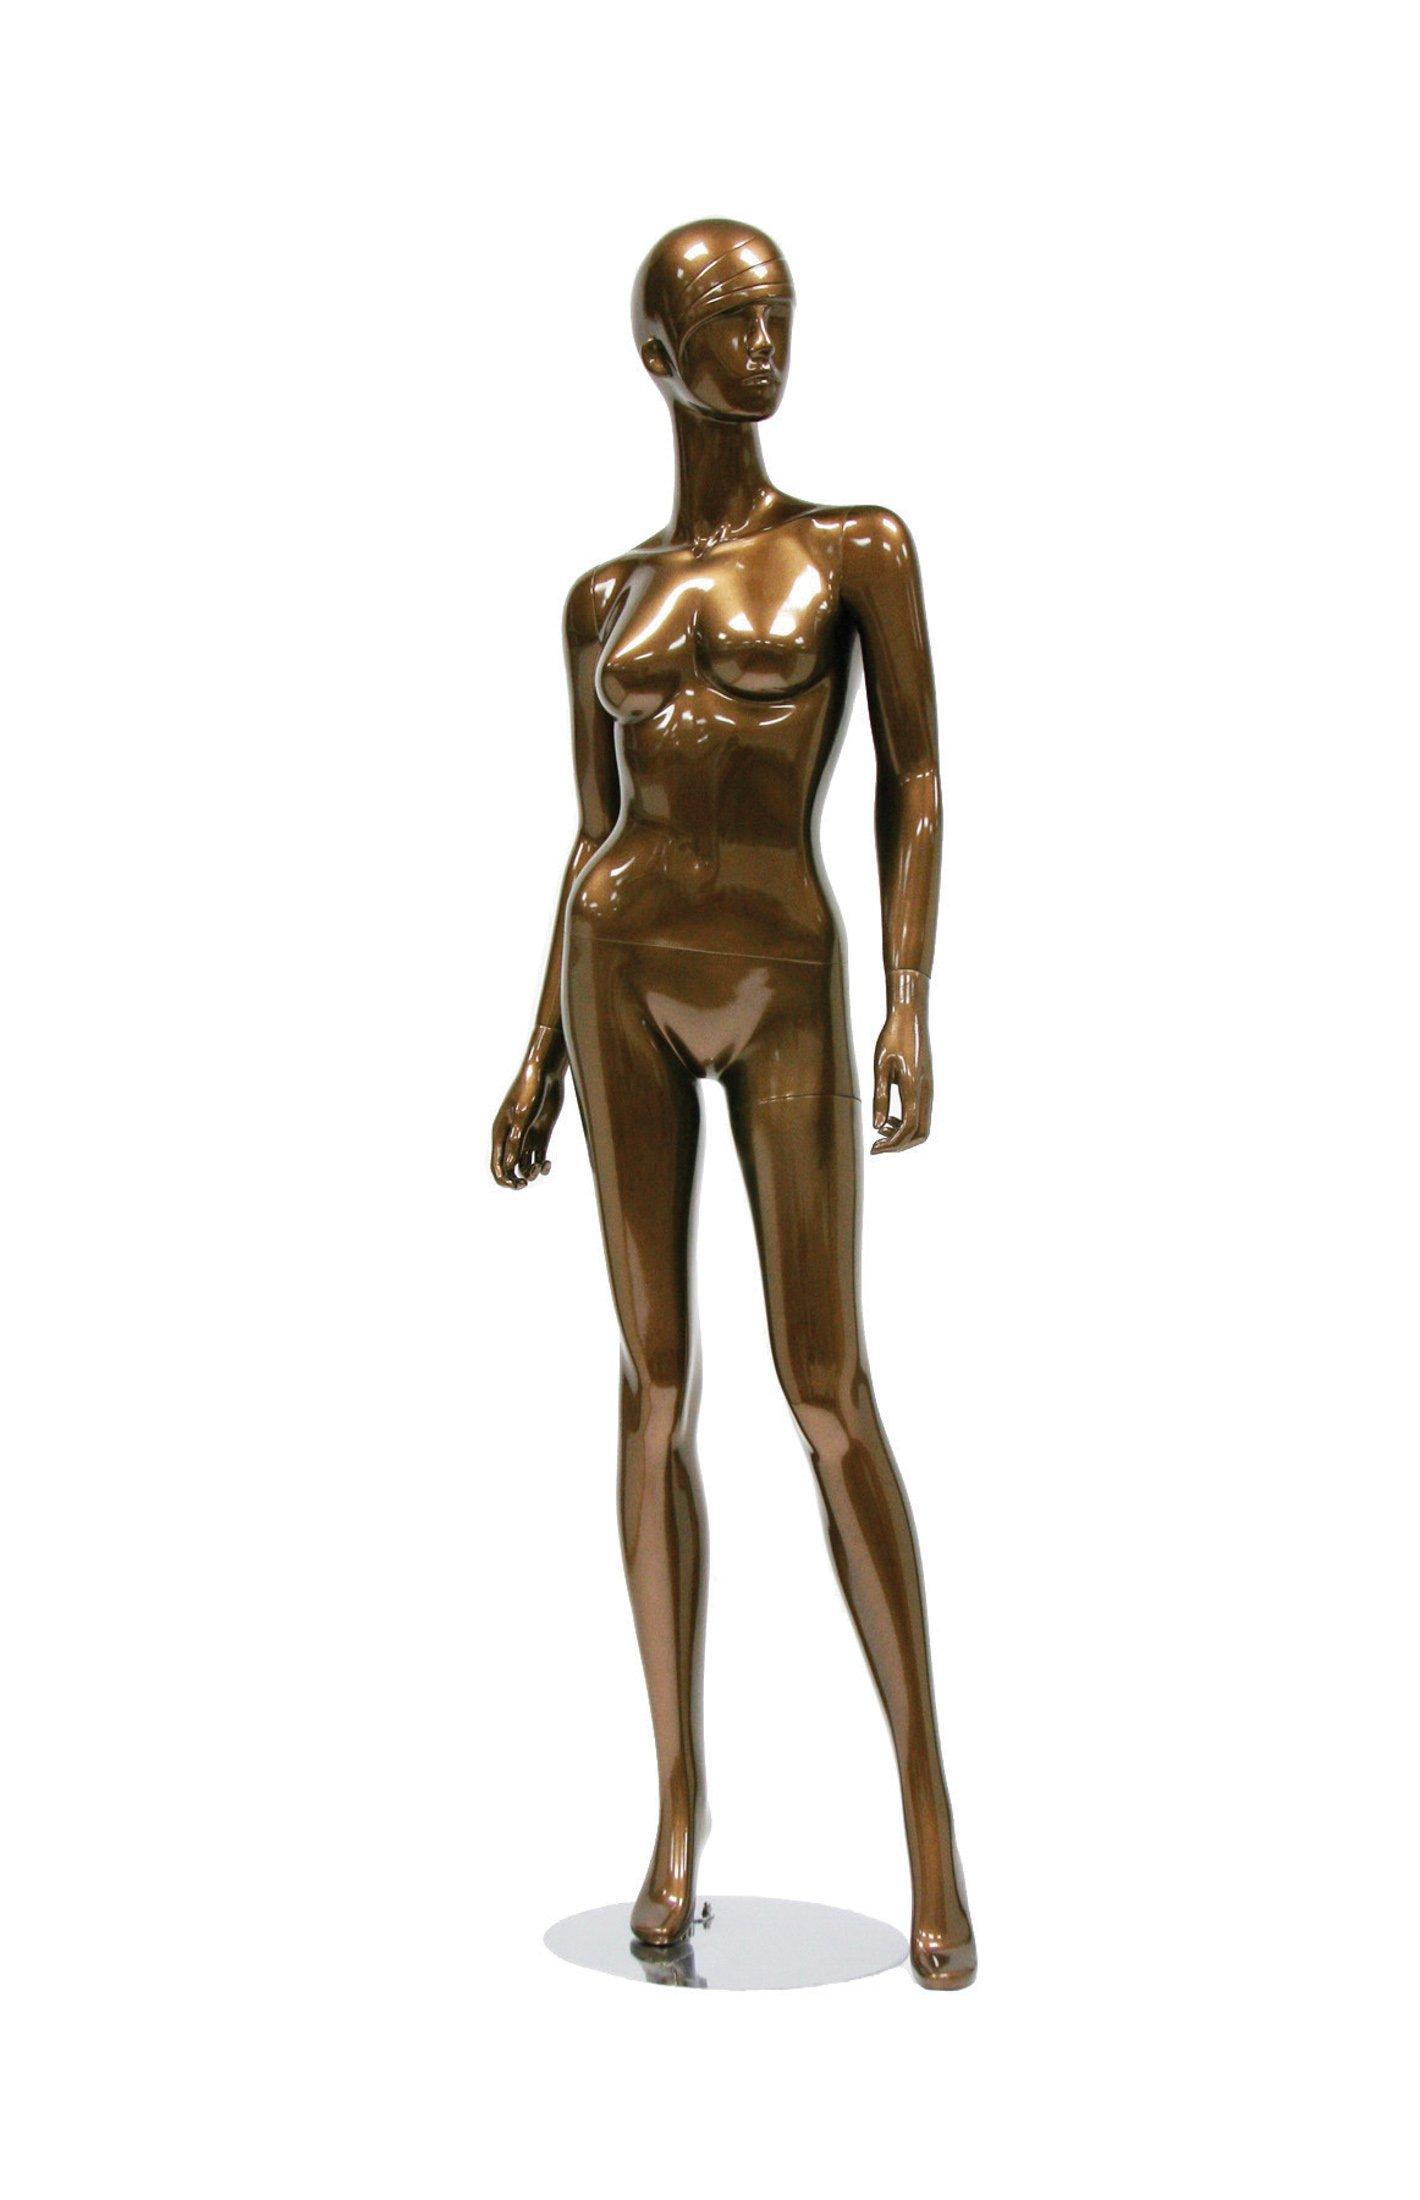 Newtech Display MAF-S2-401/SMBR (401) Trendy Female Mannequin, Shiny Metallic Bronze